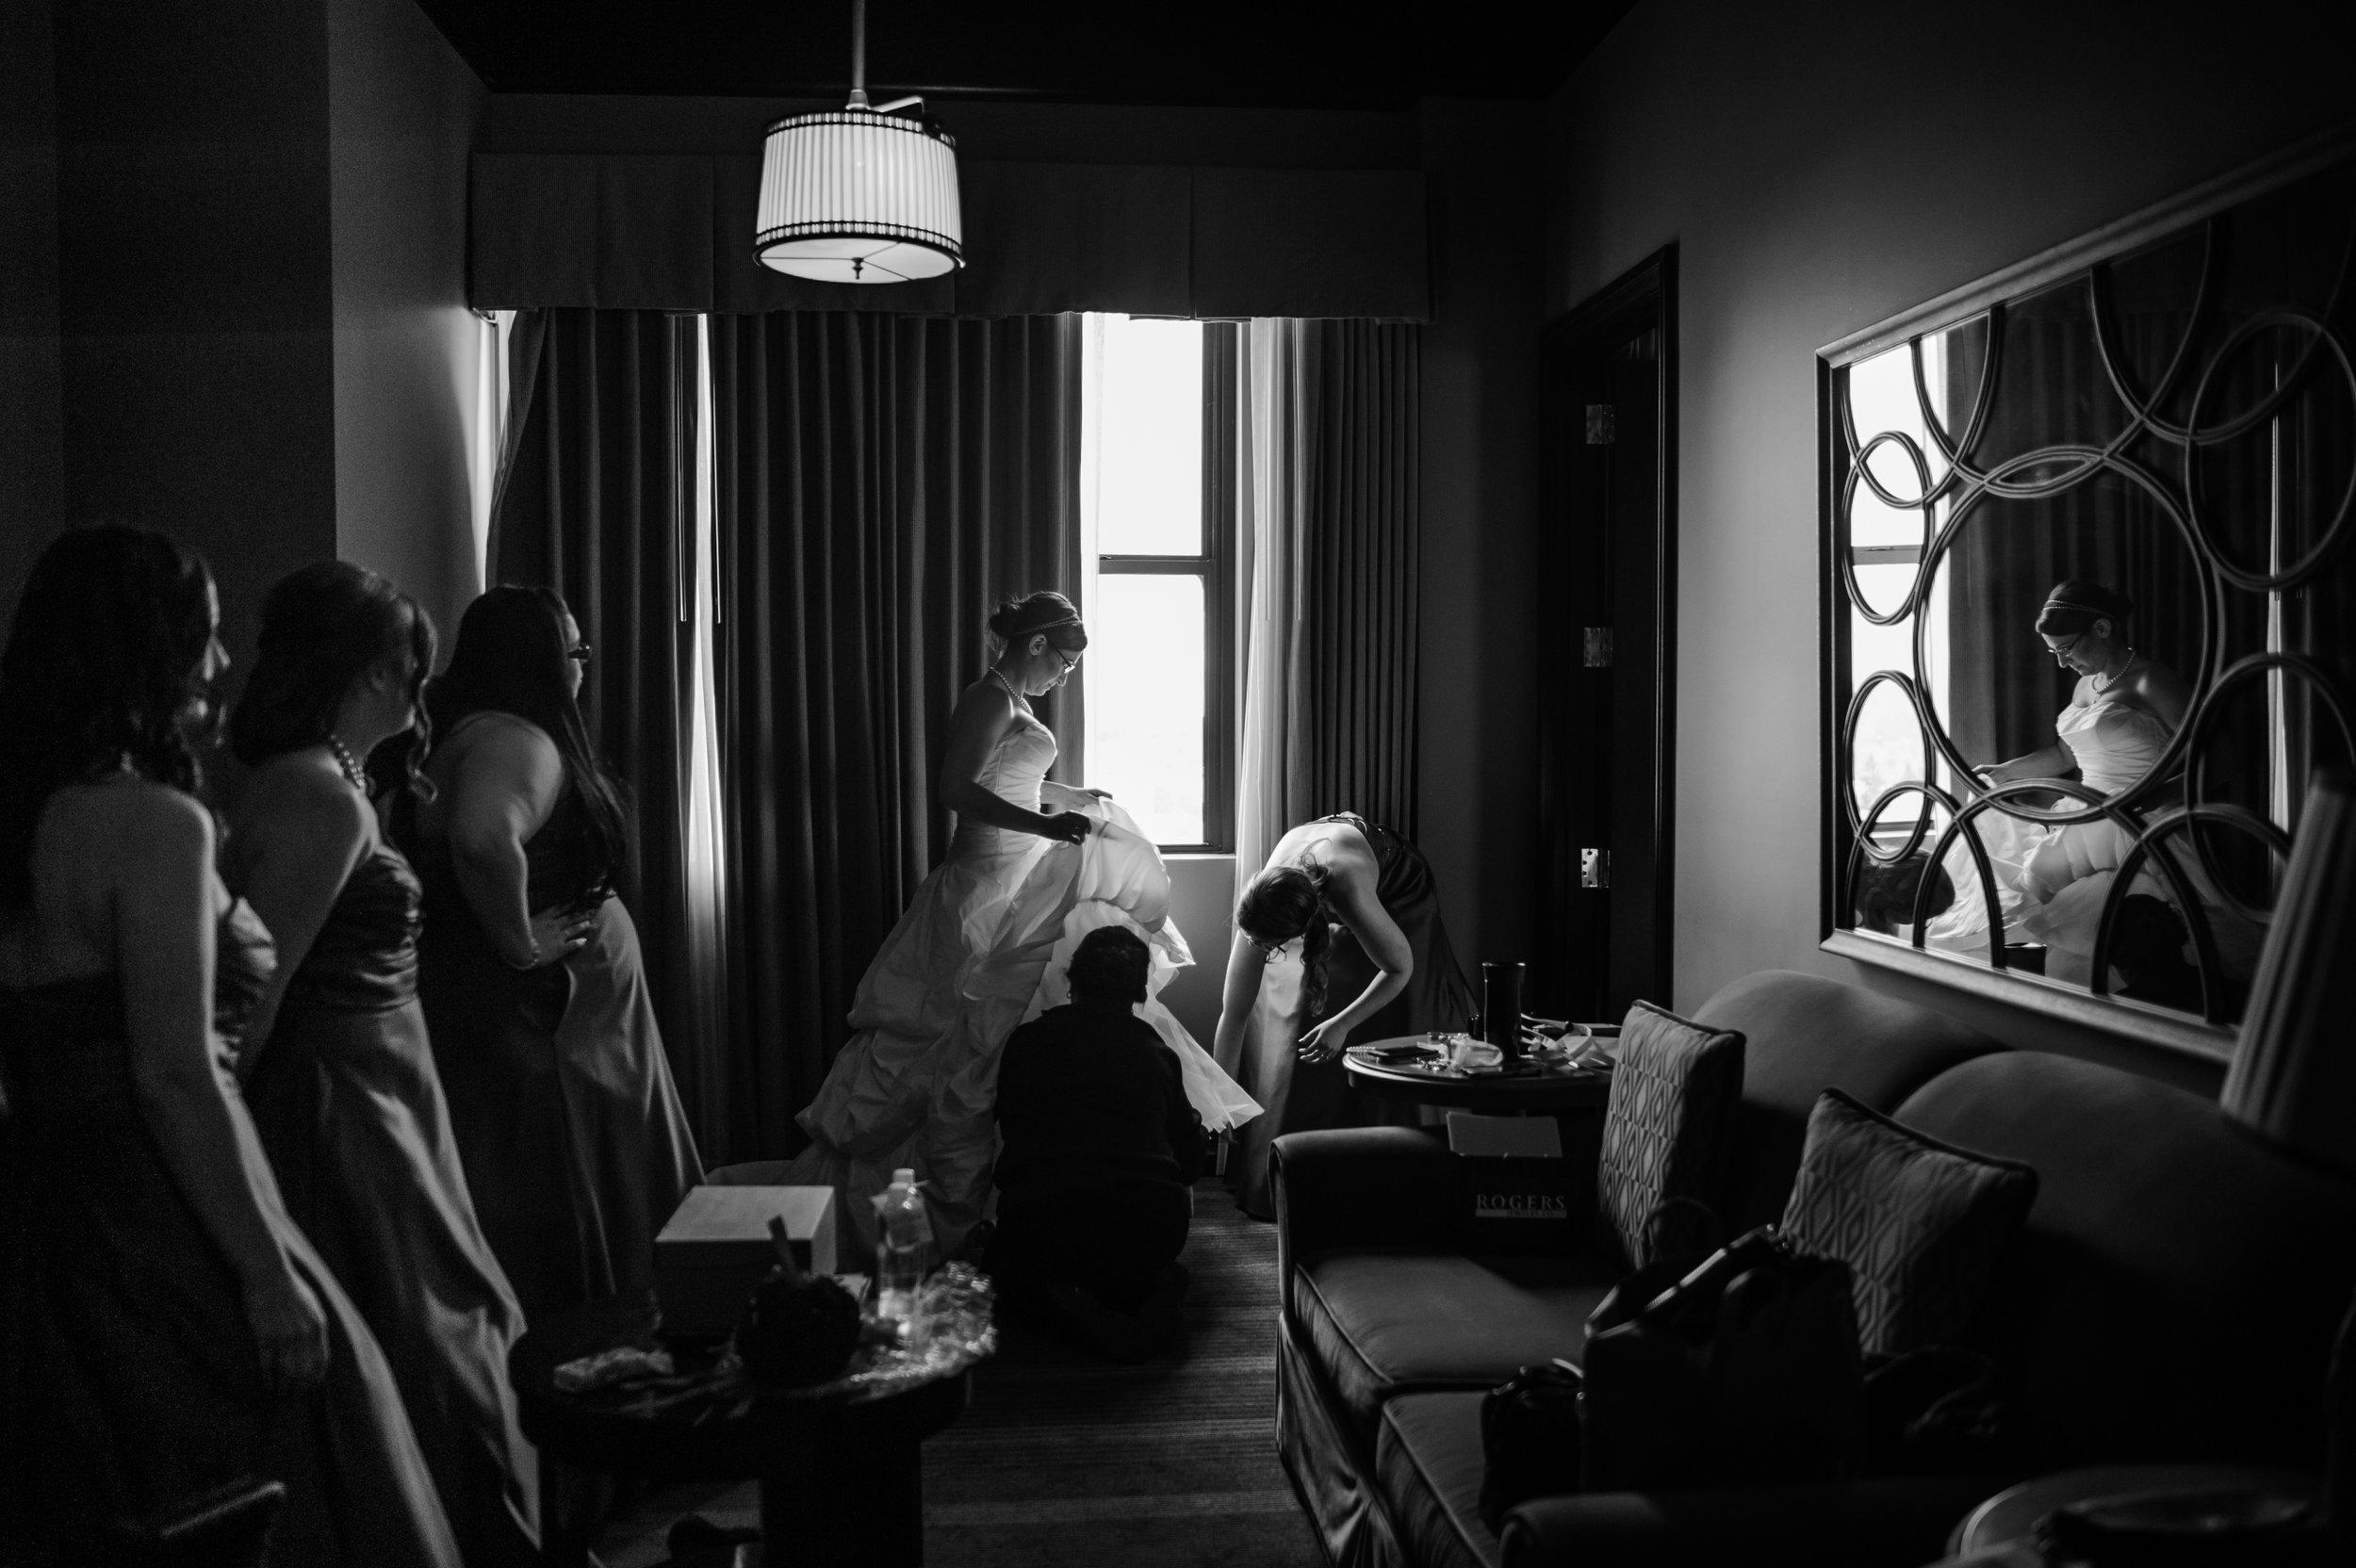 judith-john-006-citizen-hotel-sacramento-wedding-photographer-katherine-nicole-photography.JPG